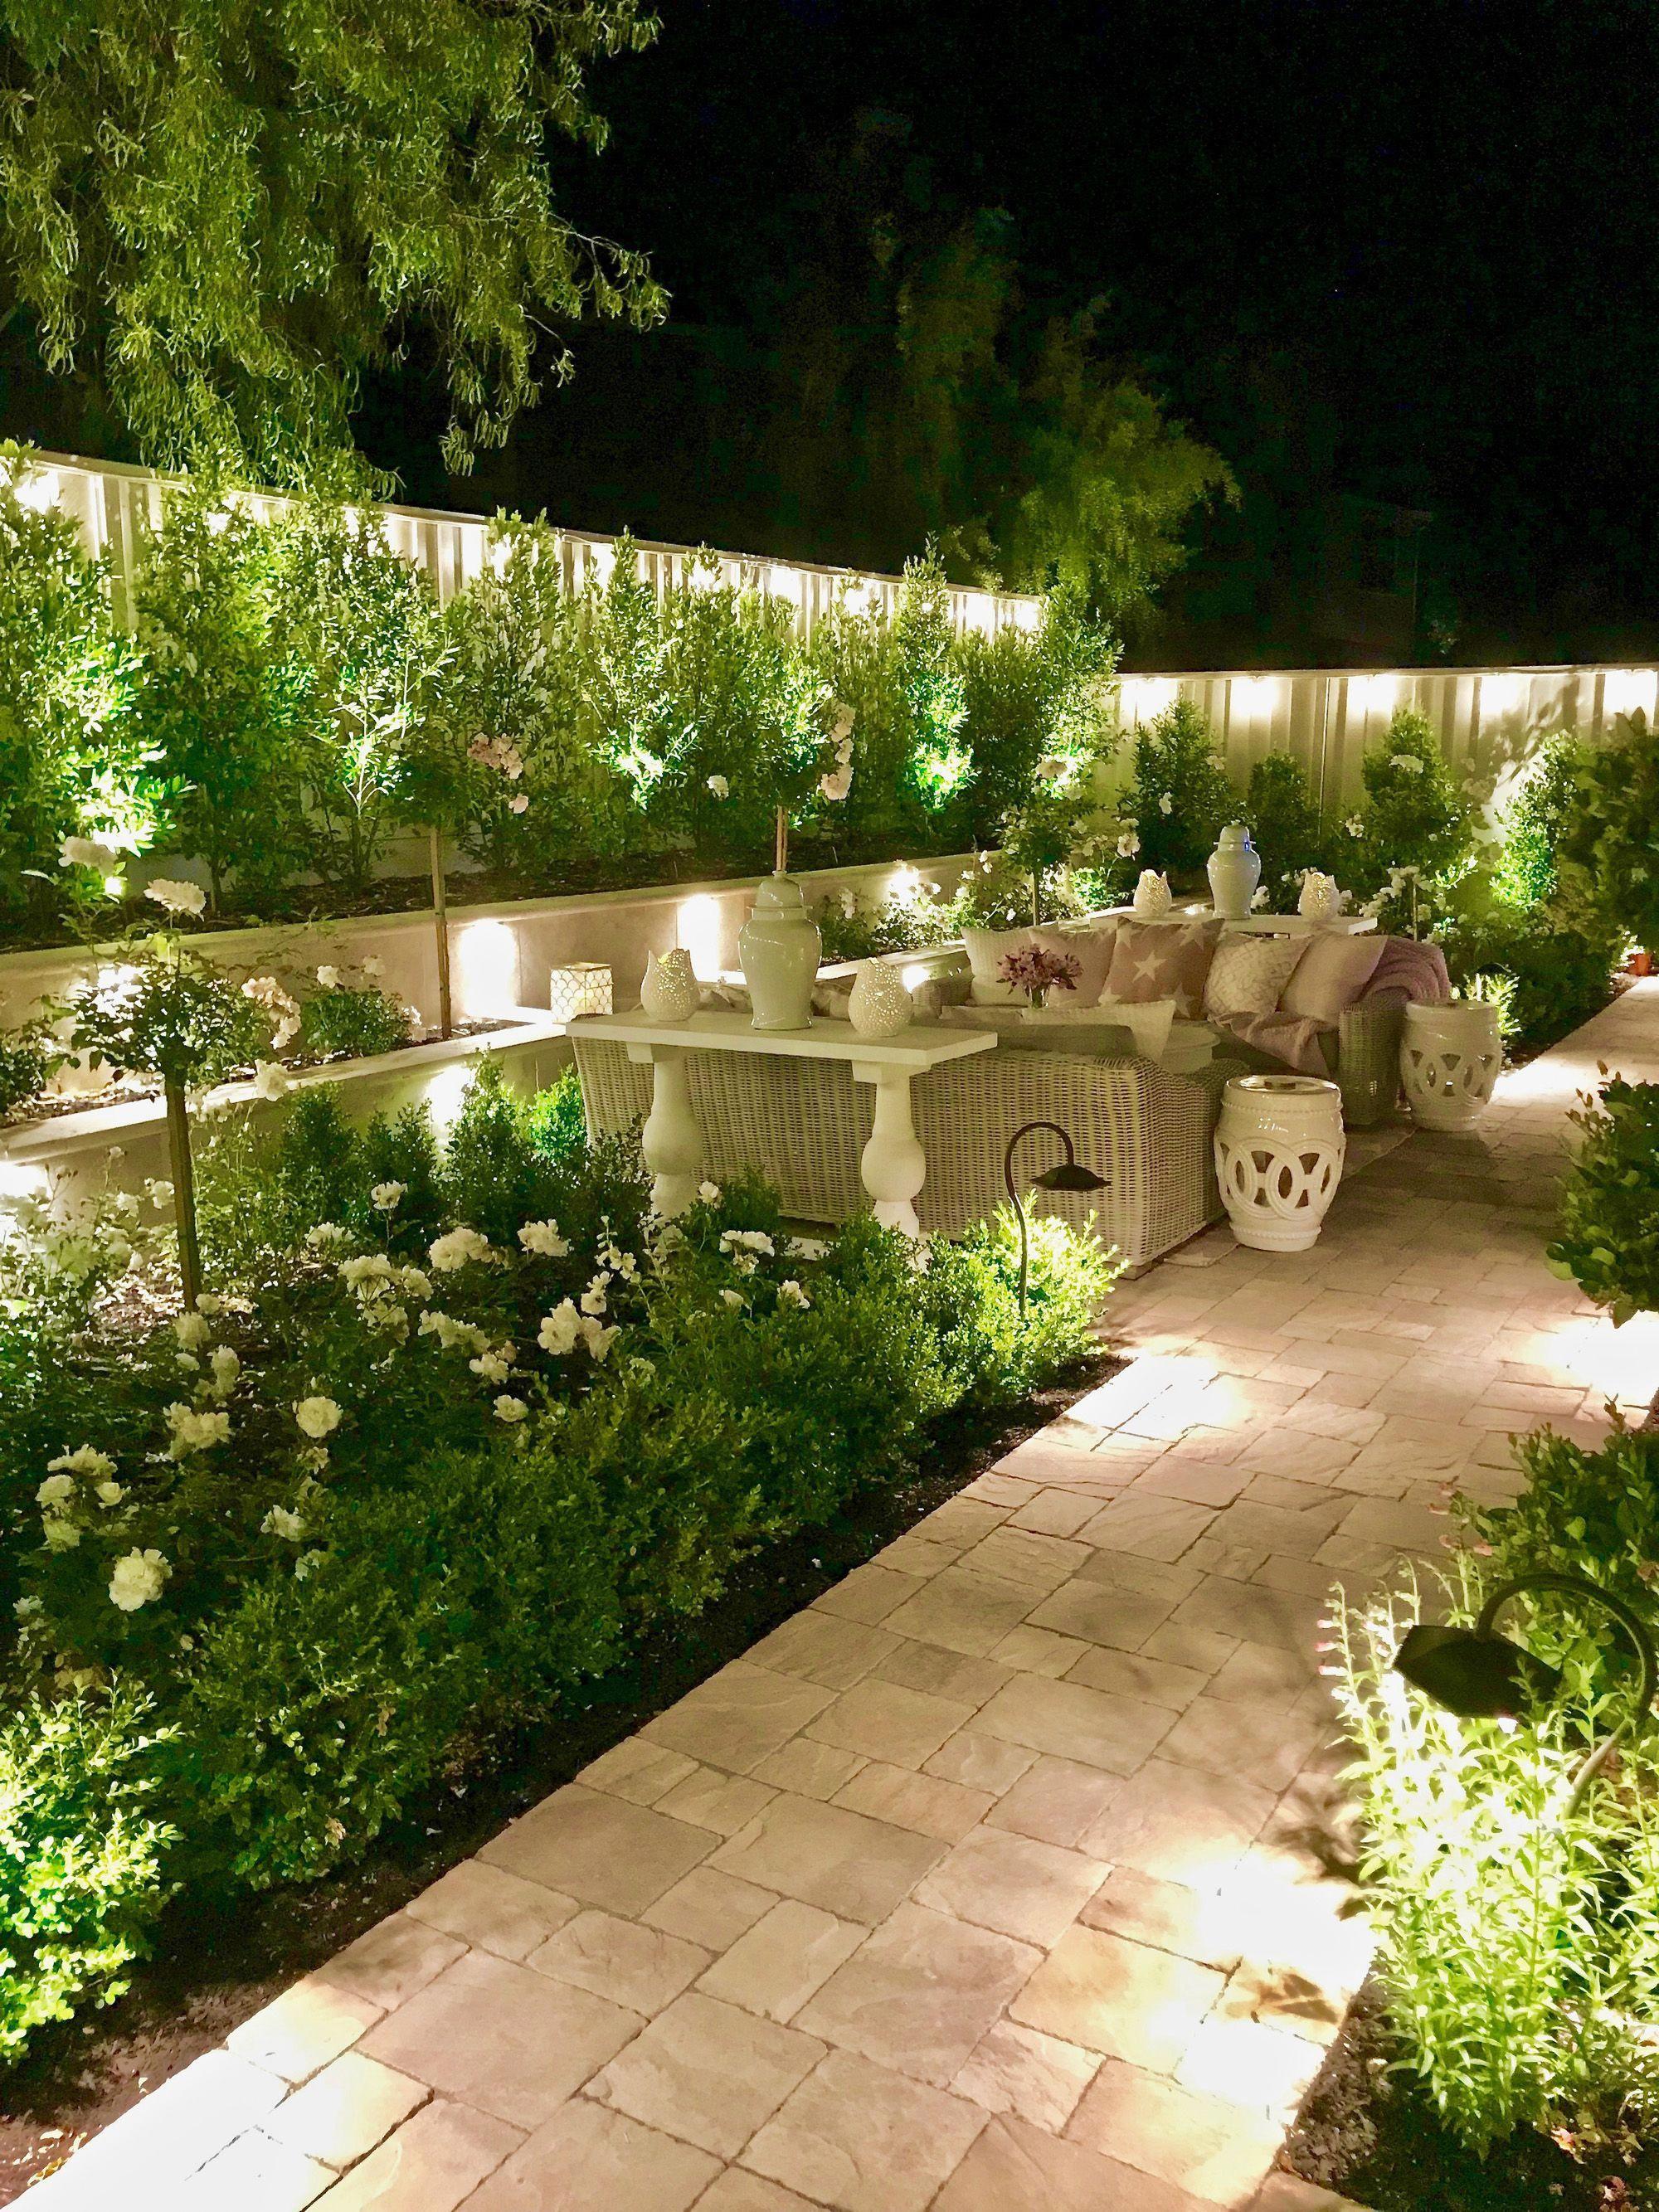 Go Green With Solar Garden Lights Small Backyard Landscaping Small Patio Garden Patio Garden